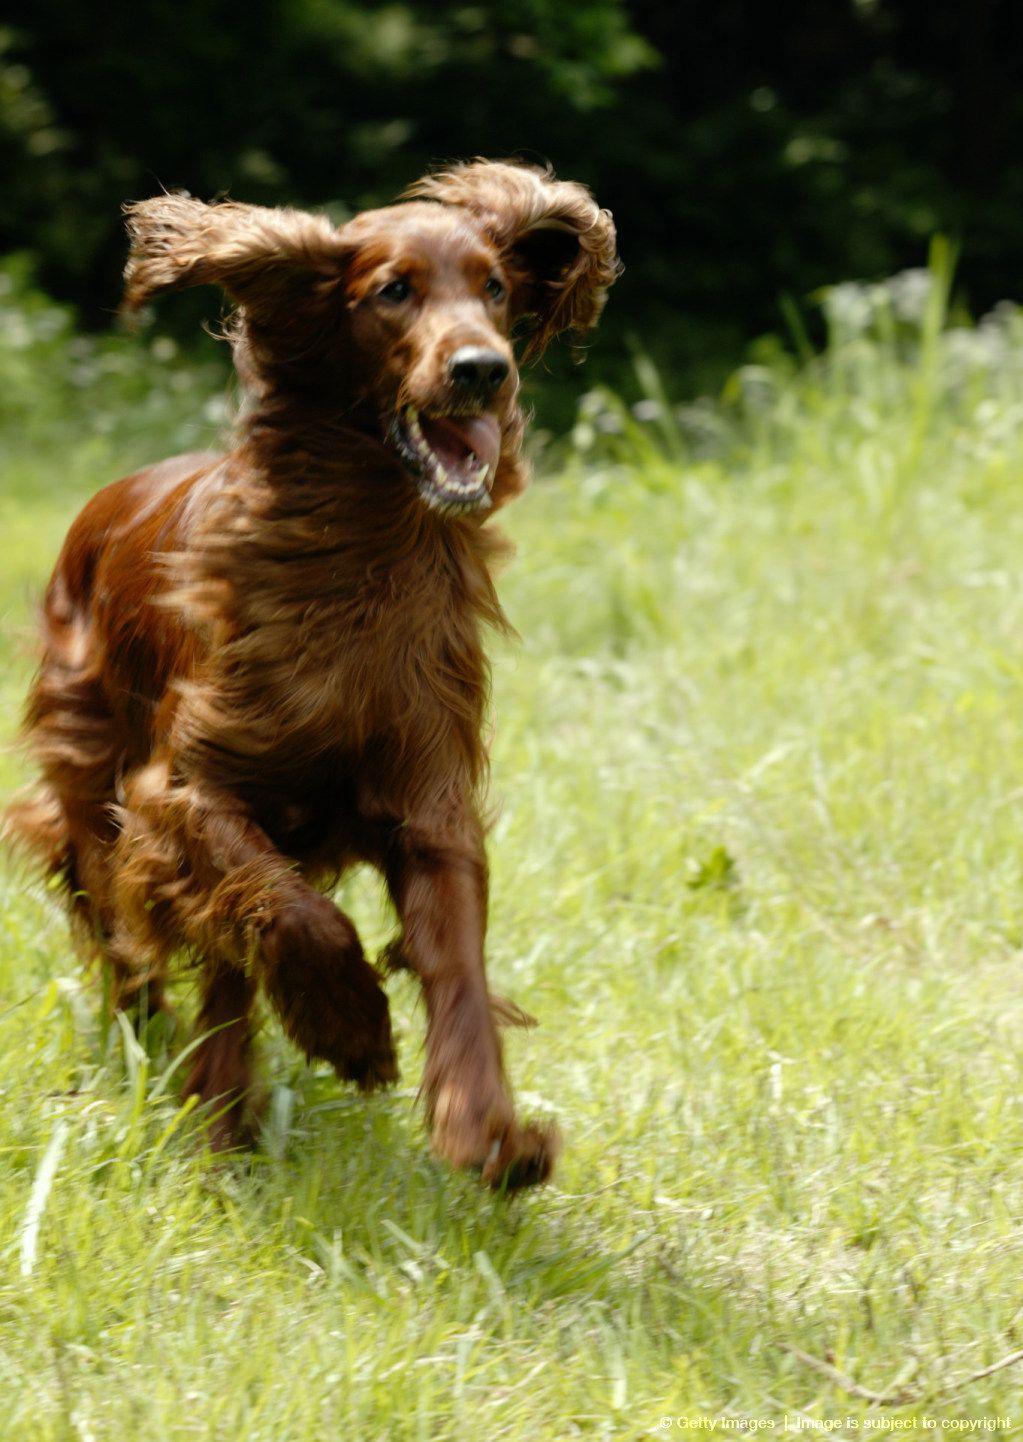 Irish Setter dog art portraits, photographs, information